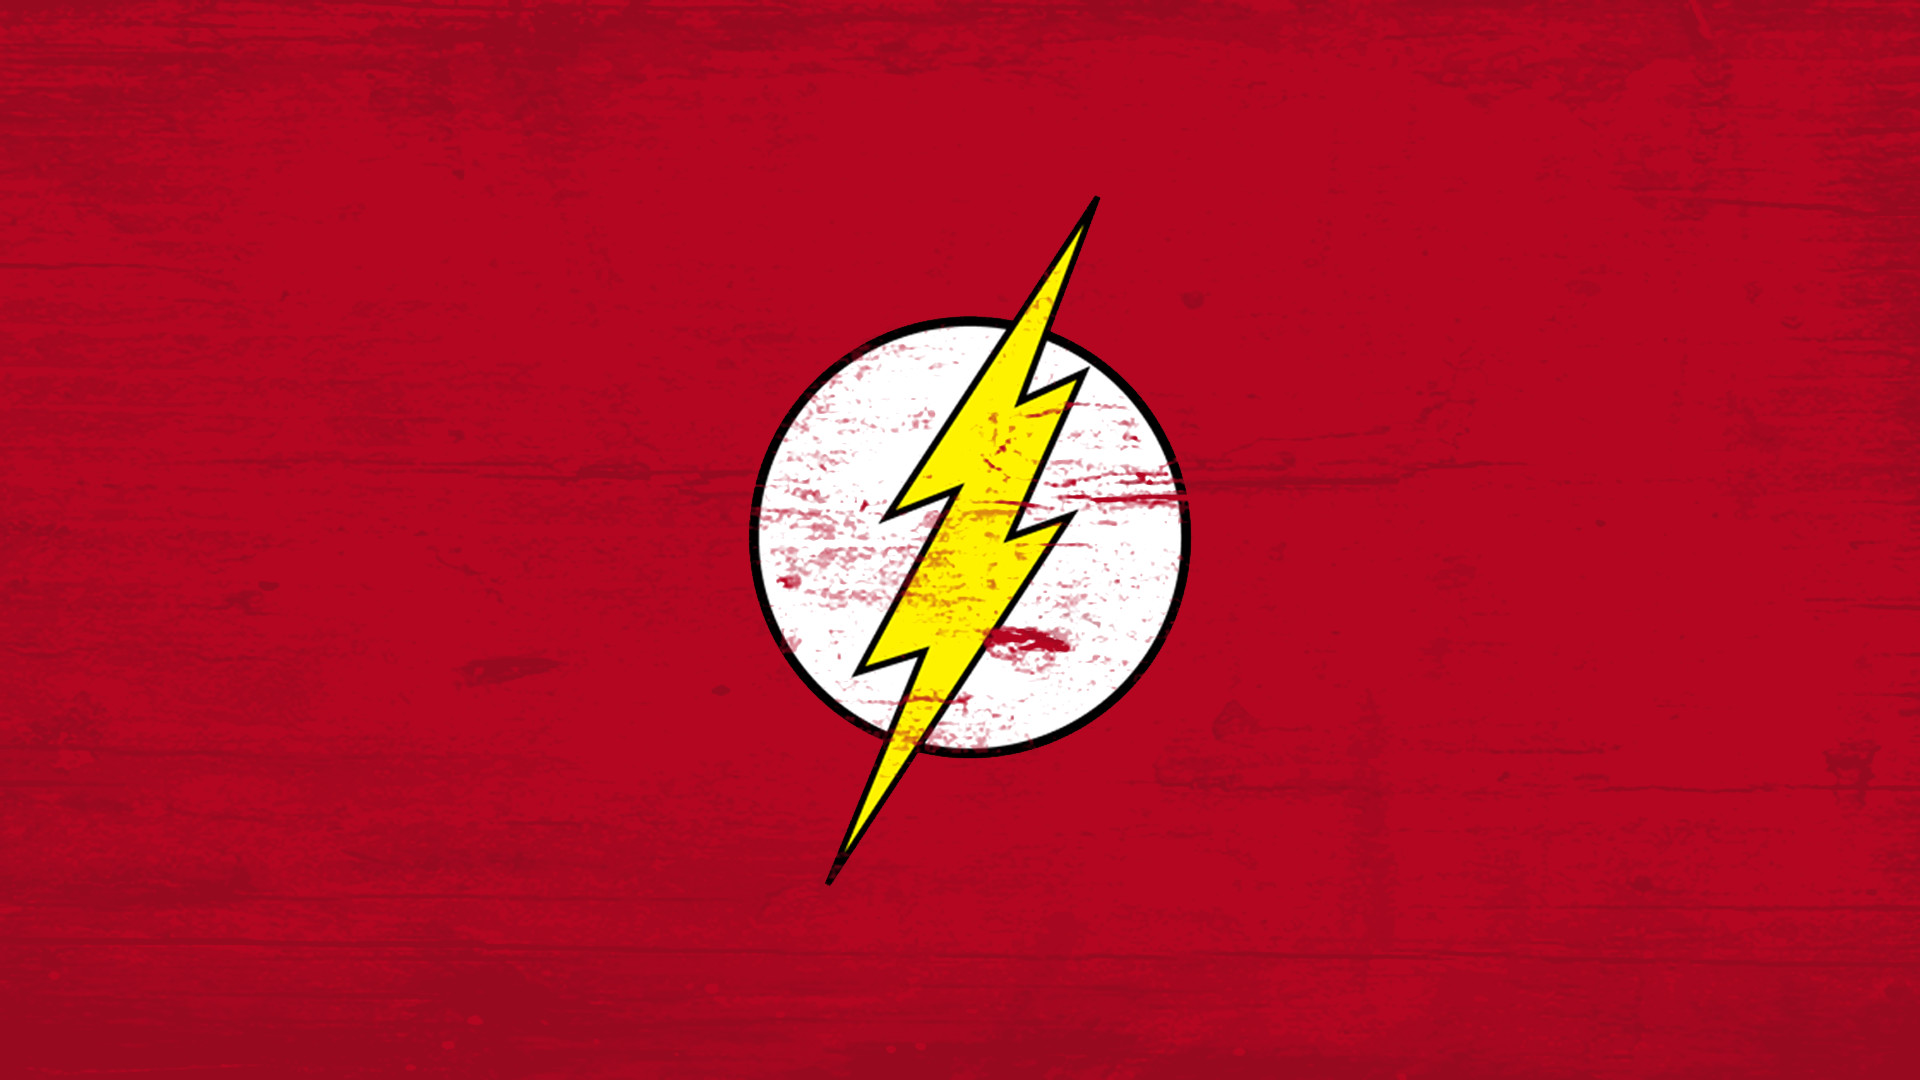 The Flash Wallpaper HD | HD Wallpapers | Pinterest | Flash wallpaper, Hd  wallpaper and Wallpaper